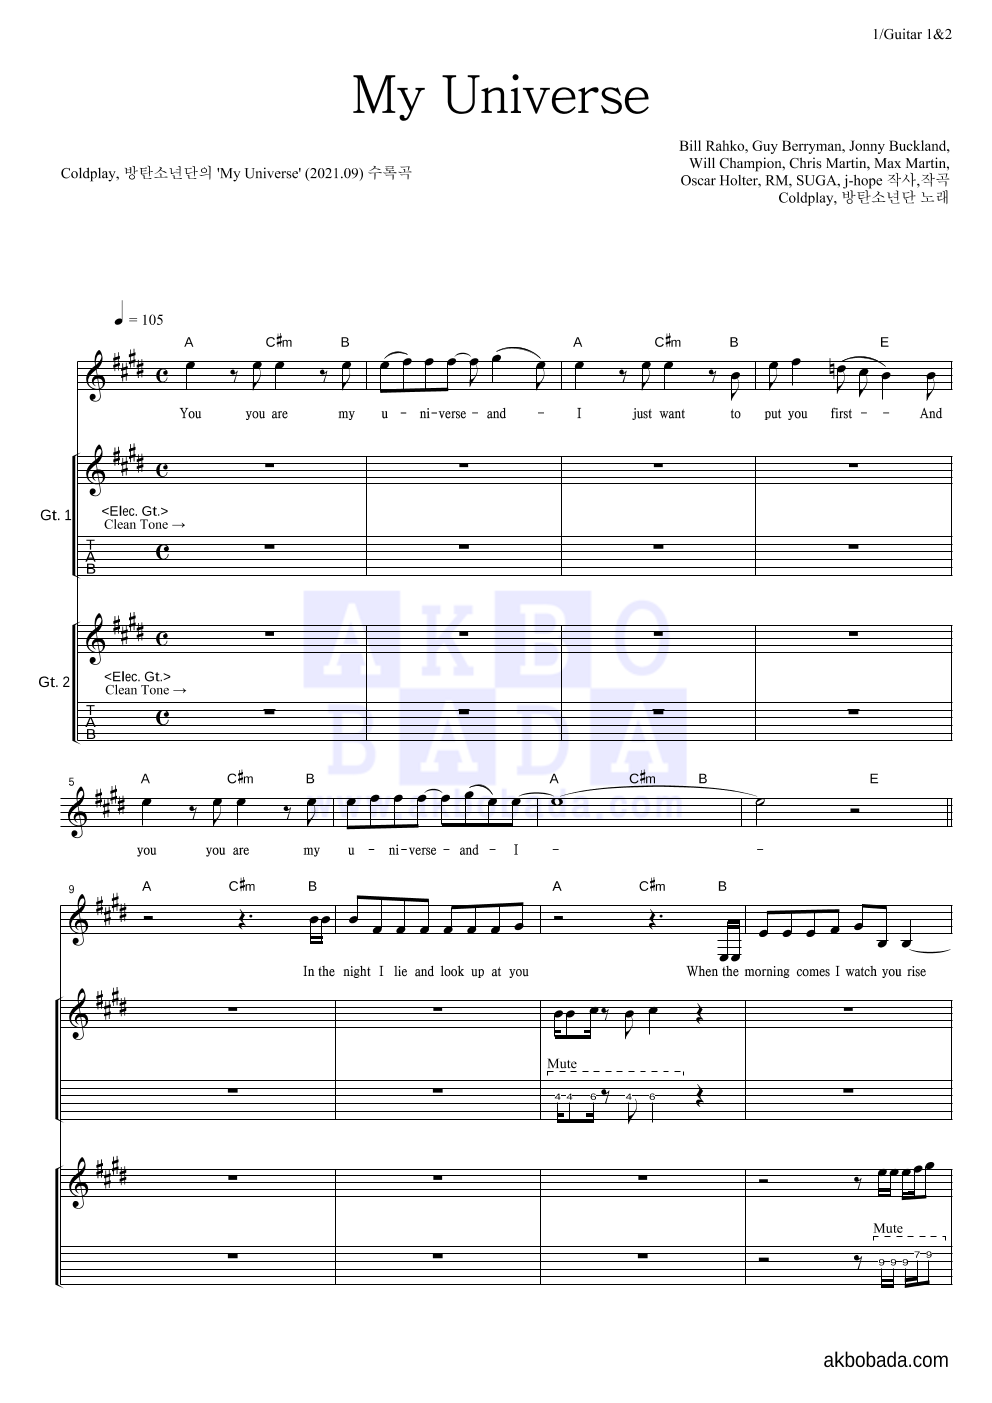 Coldplay,방탄소년단 - My Universe 기타1,2 악보